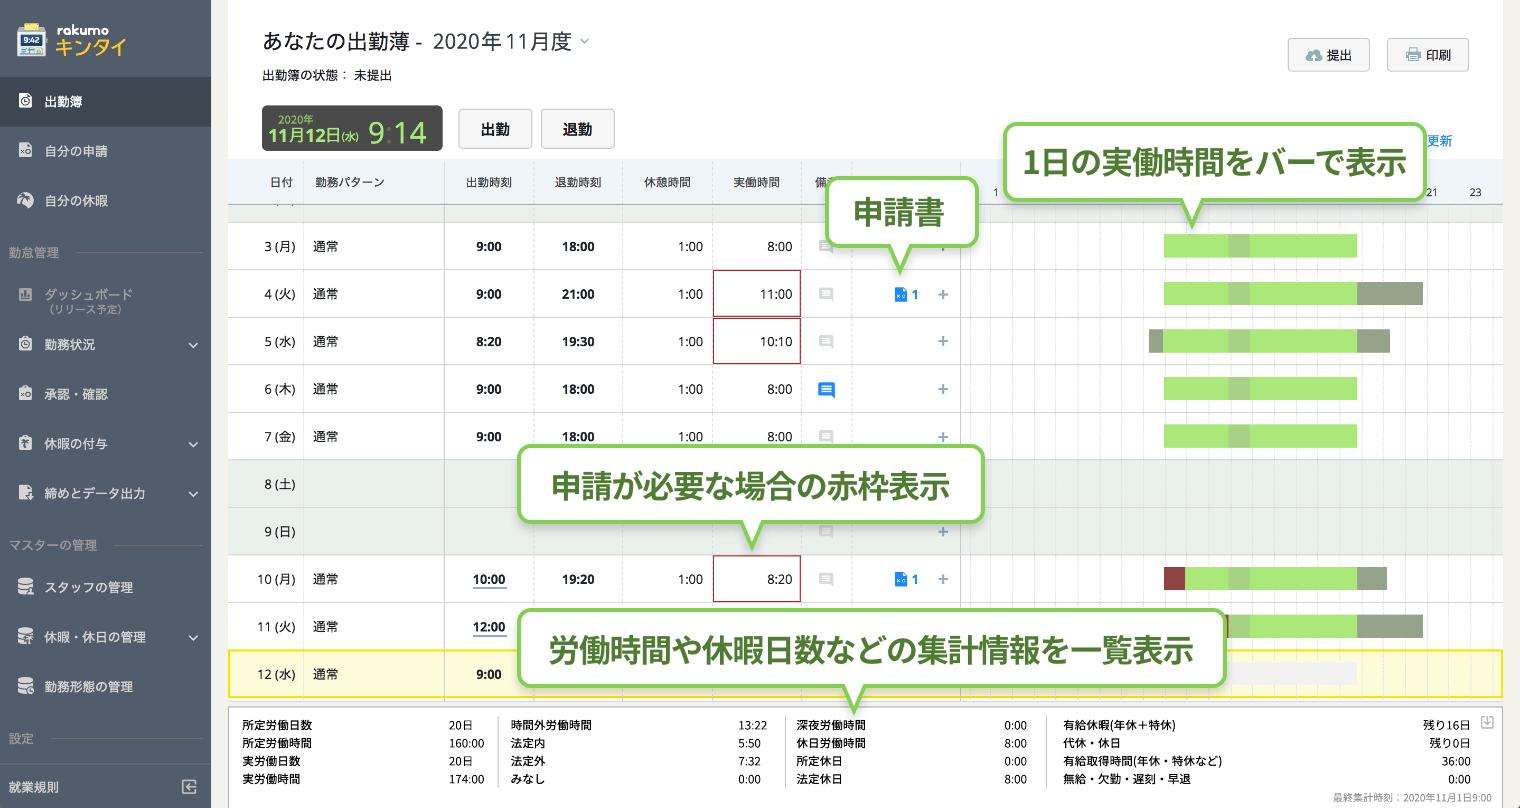 rakumo キンタイ CSVデータ出力設定画面